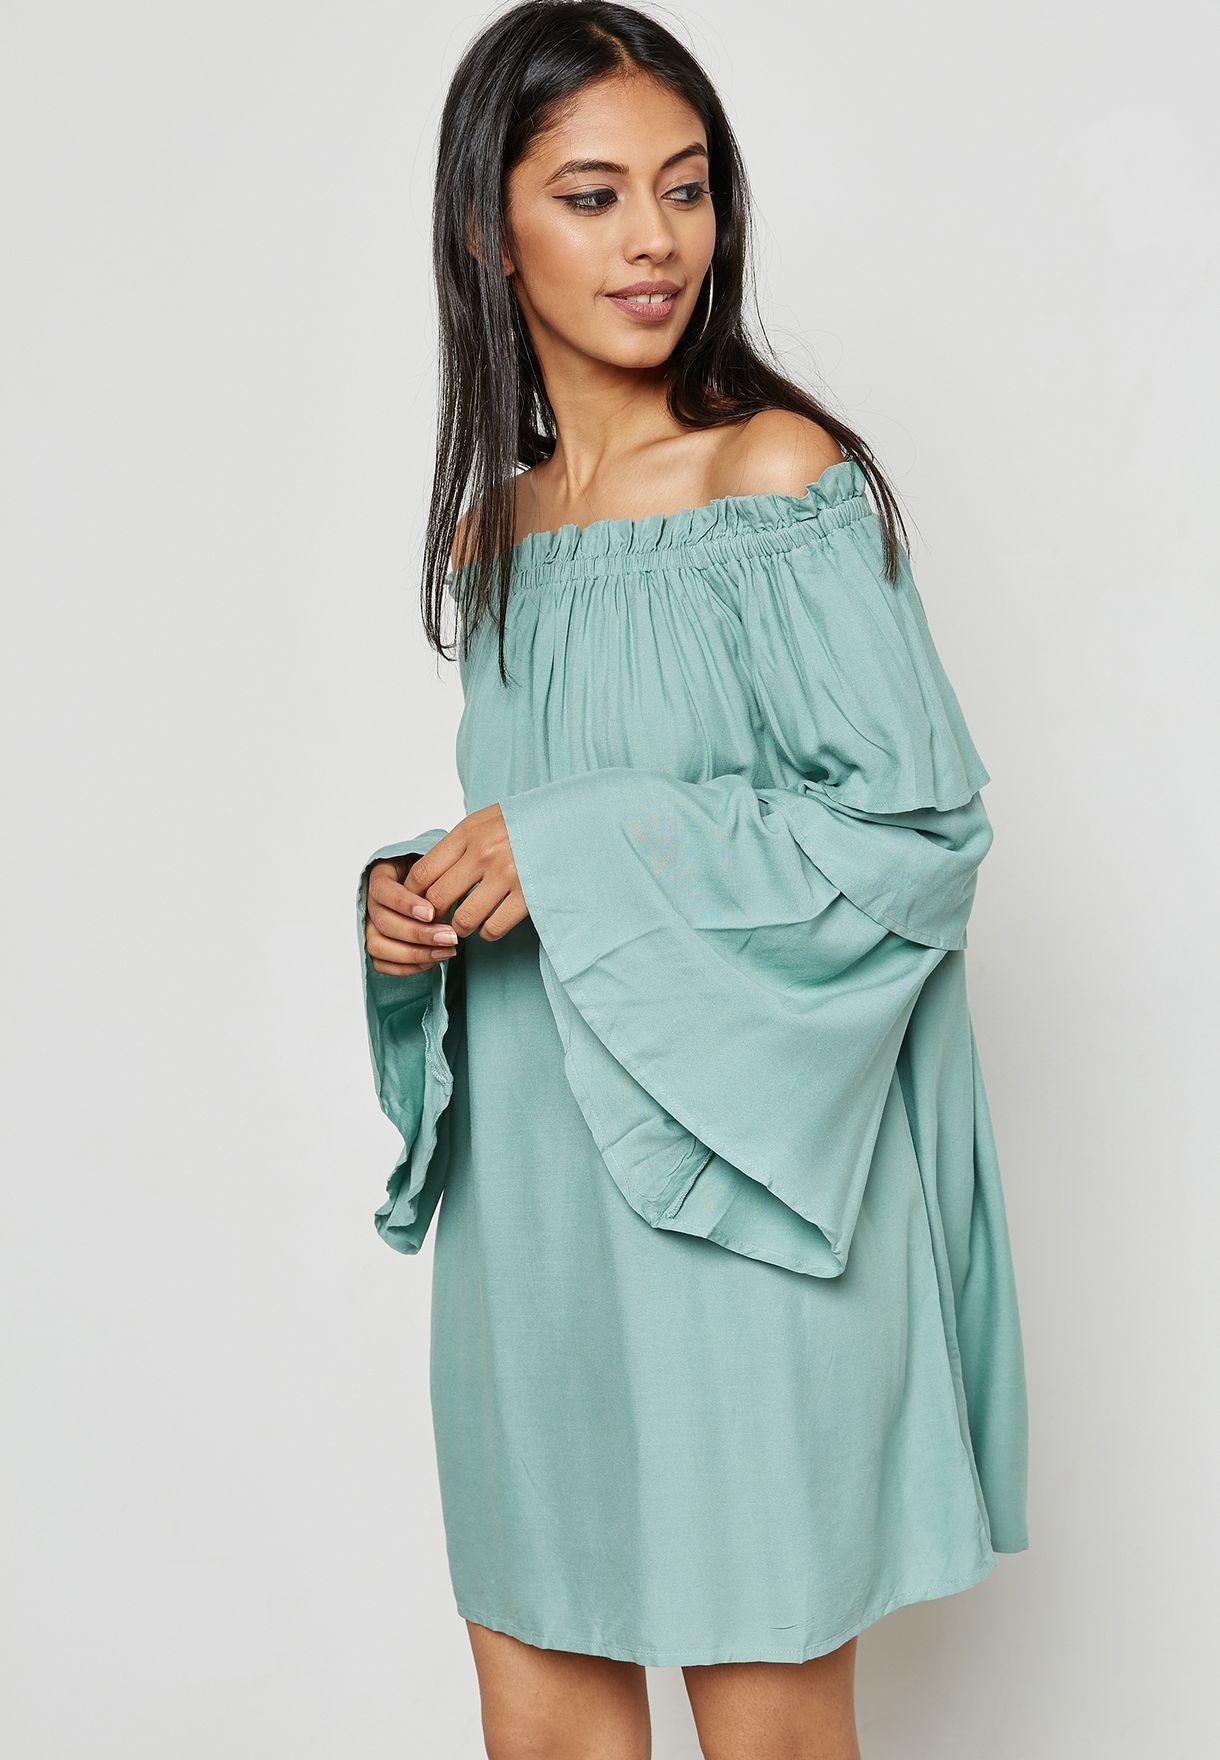 a2a5ef6f8b99 Shop Missguided blue Layered Sleeve Bardot Shift Dress DD910319 for Women  in Bahrain - MI669AT68ZBN